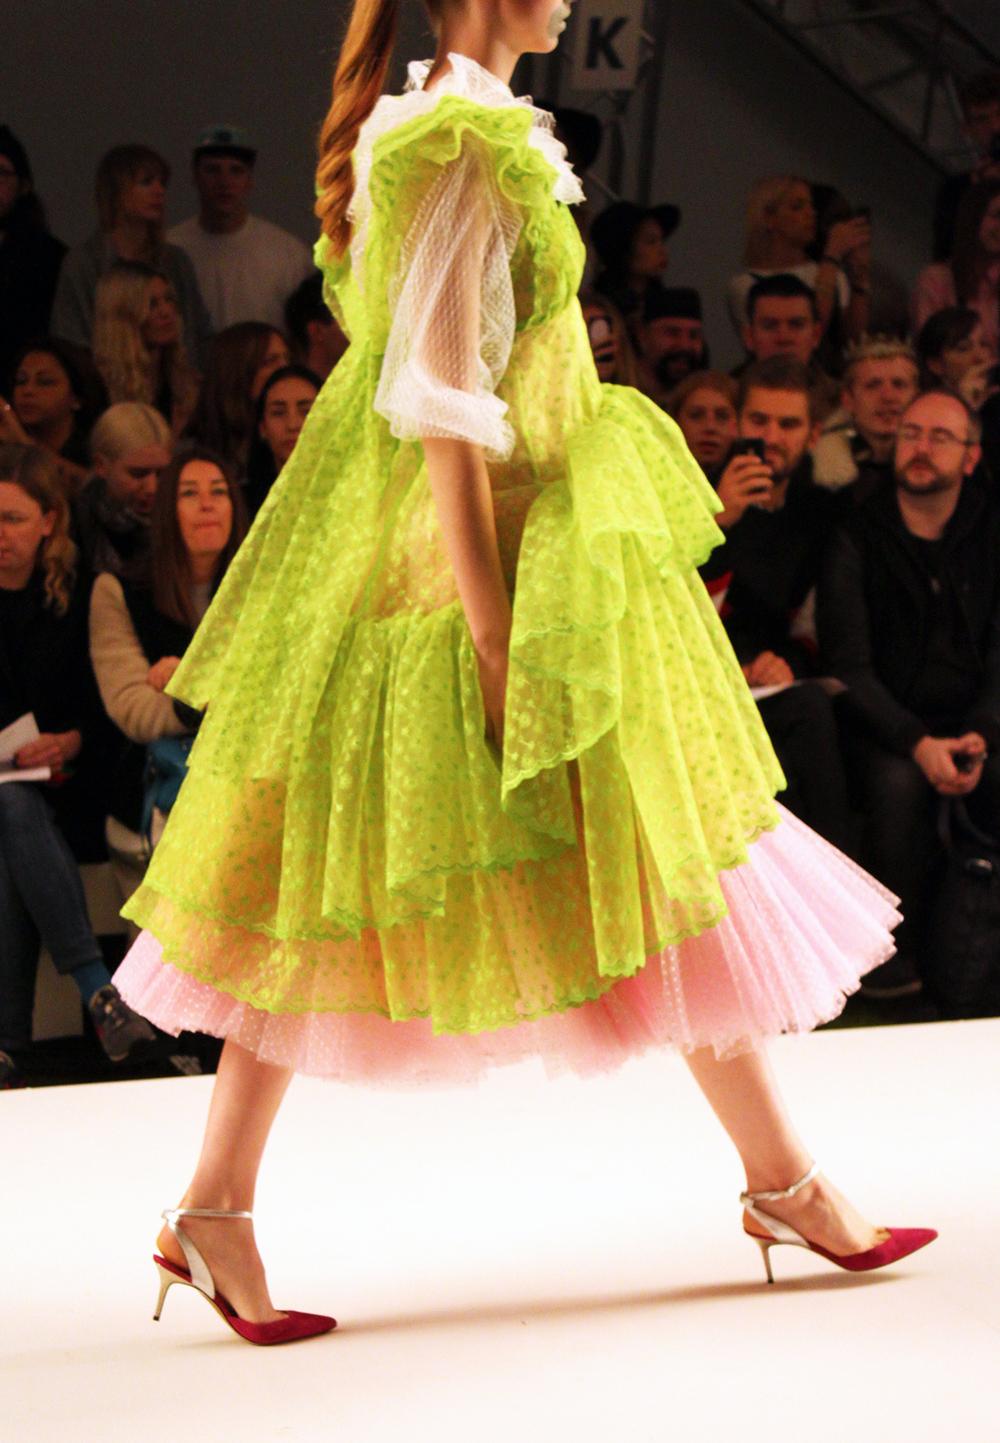 Fashion East - London Fashion Week - Second Floor Flat